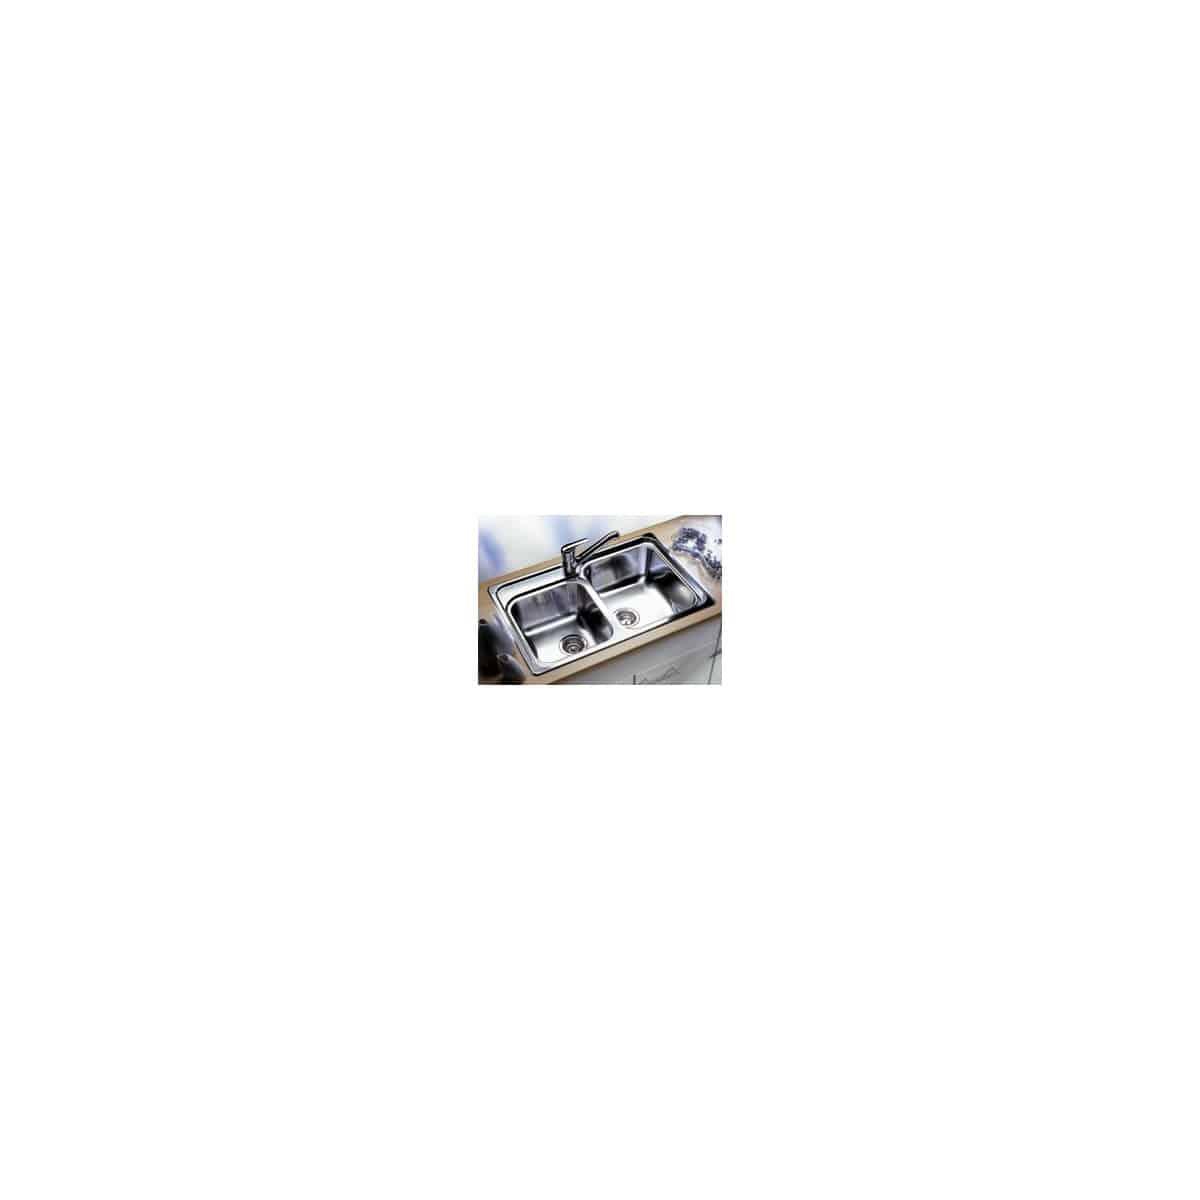 Blancoclassic 8 Inox - Inox Lisse